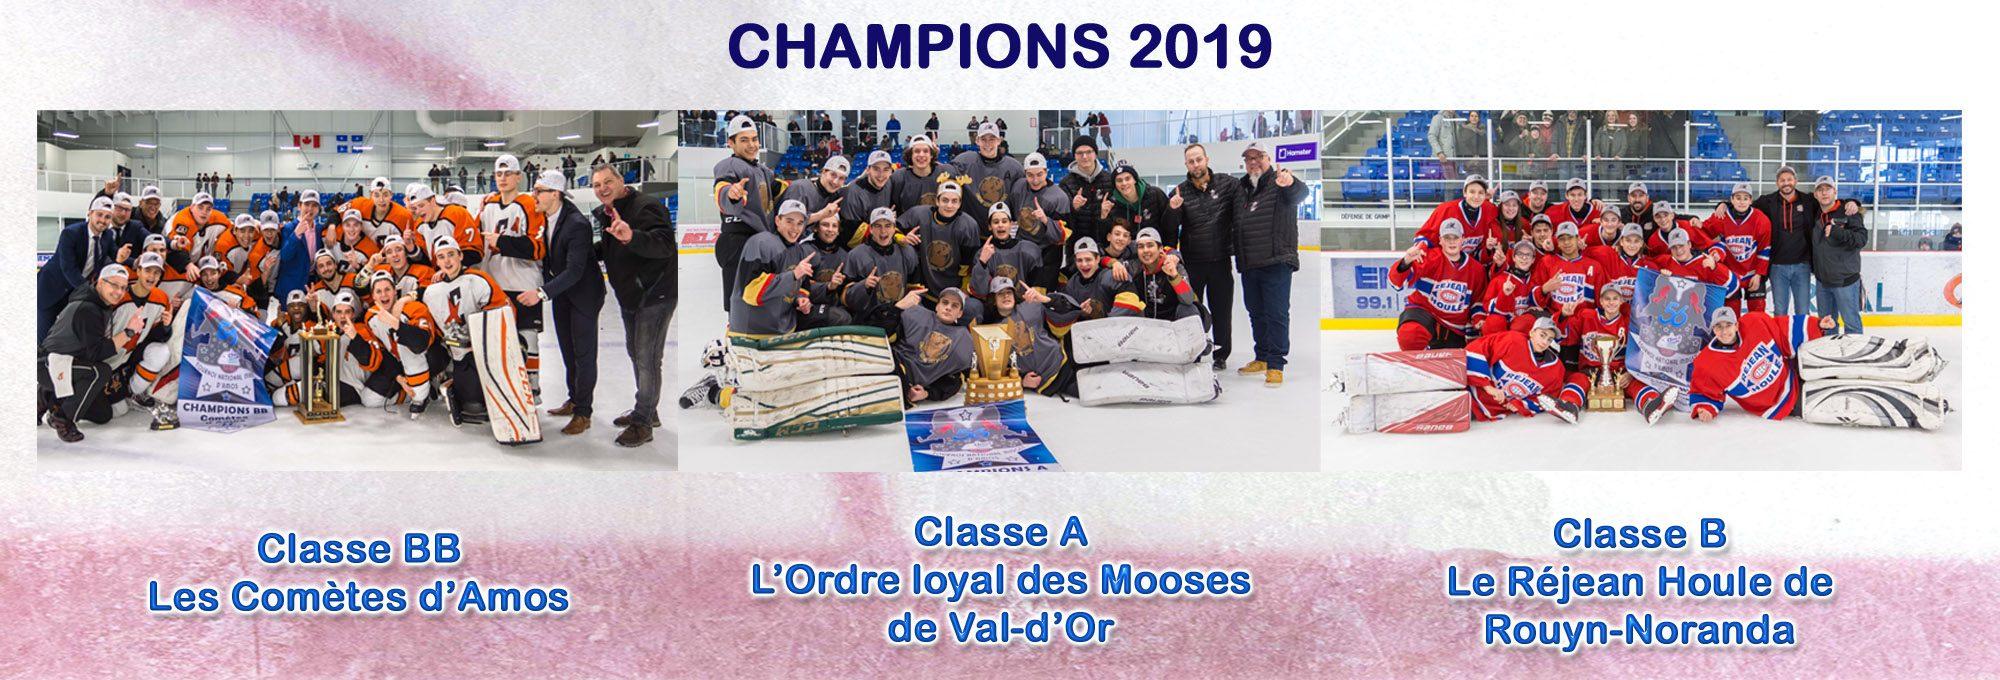 Slider Top 2000L Par 600H Champions 2019